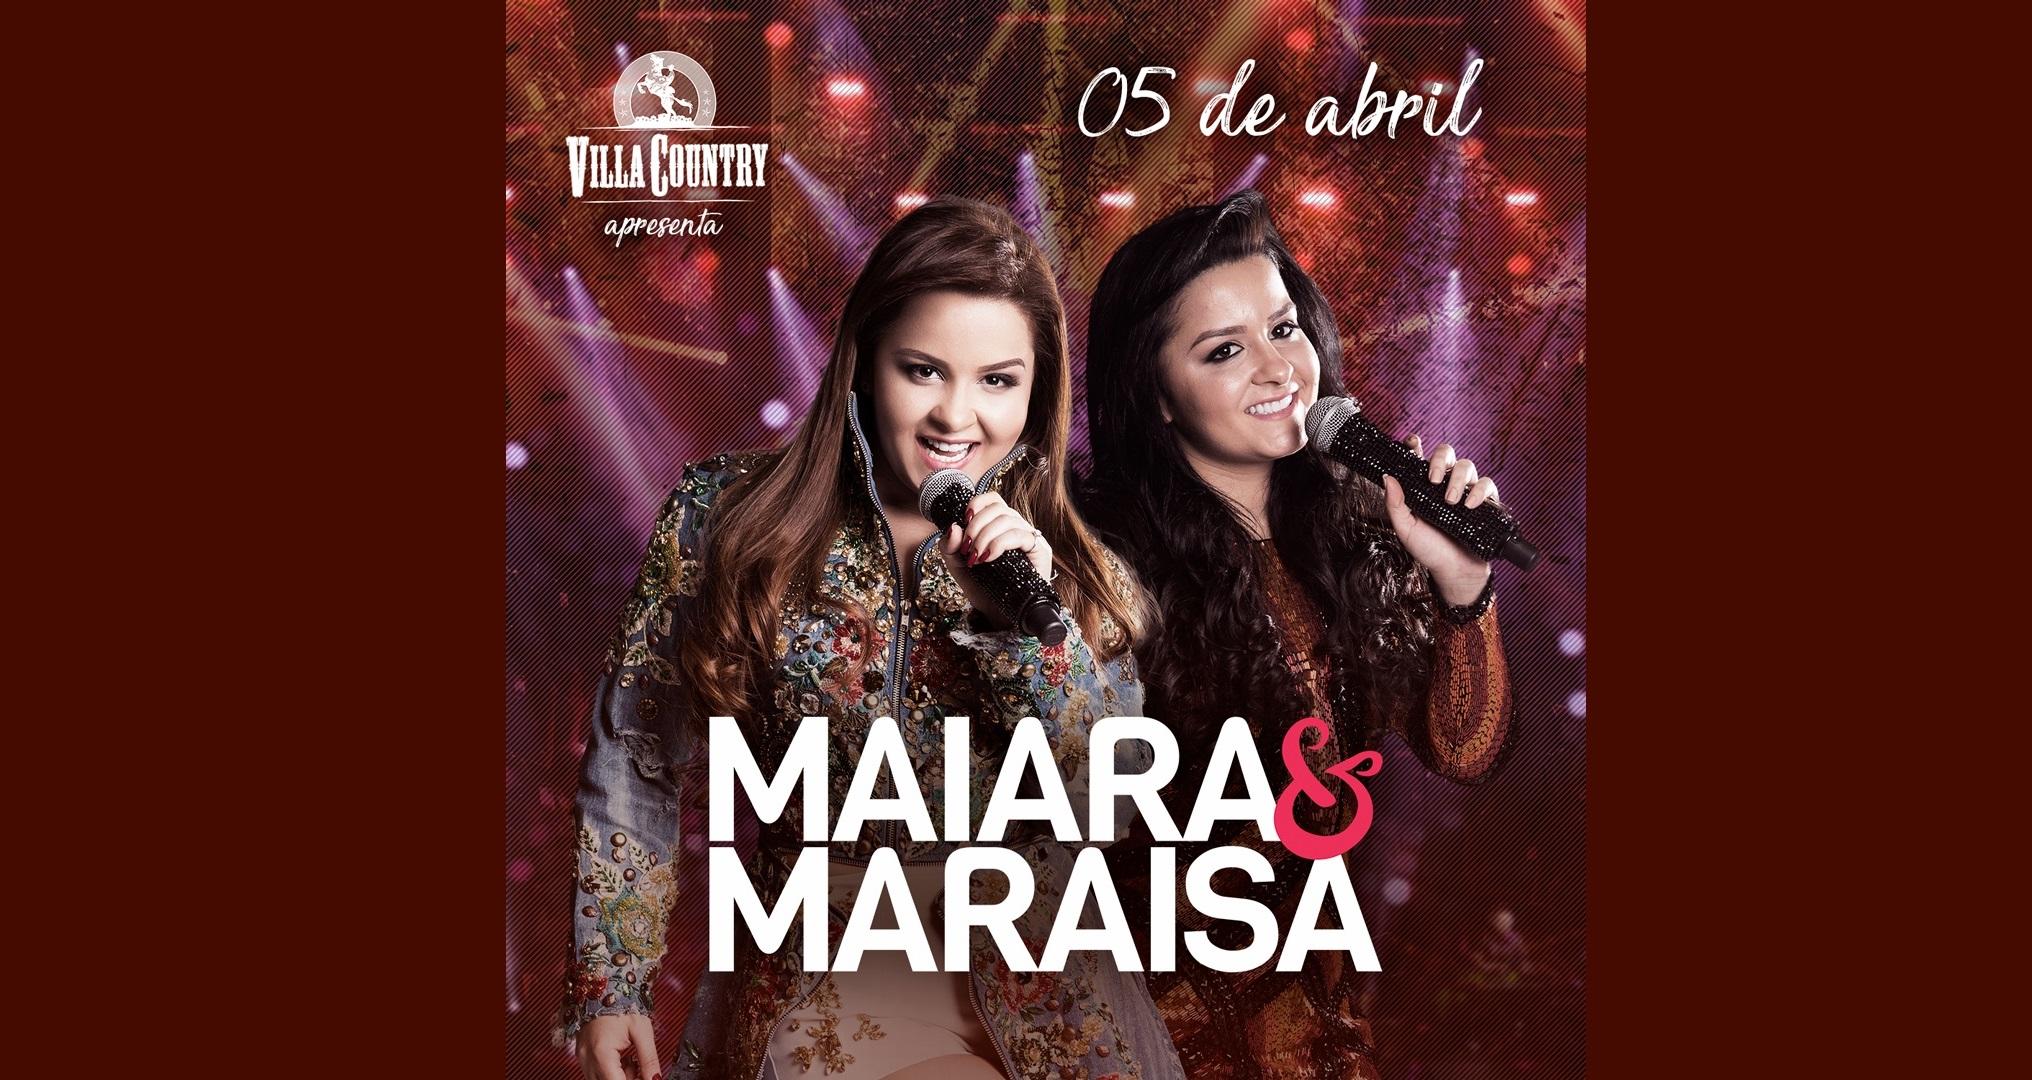 Maiara & Maraisa fazem mega show no Villa Country 41